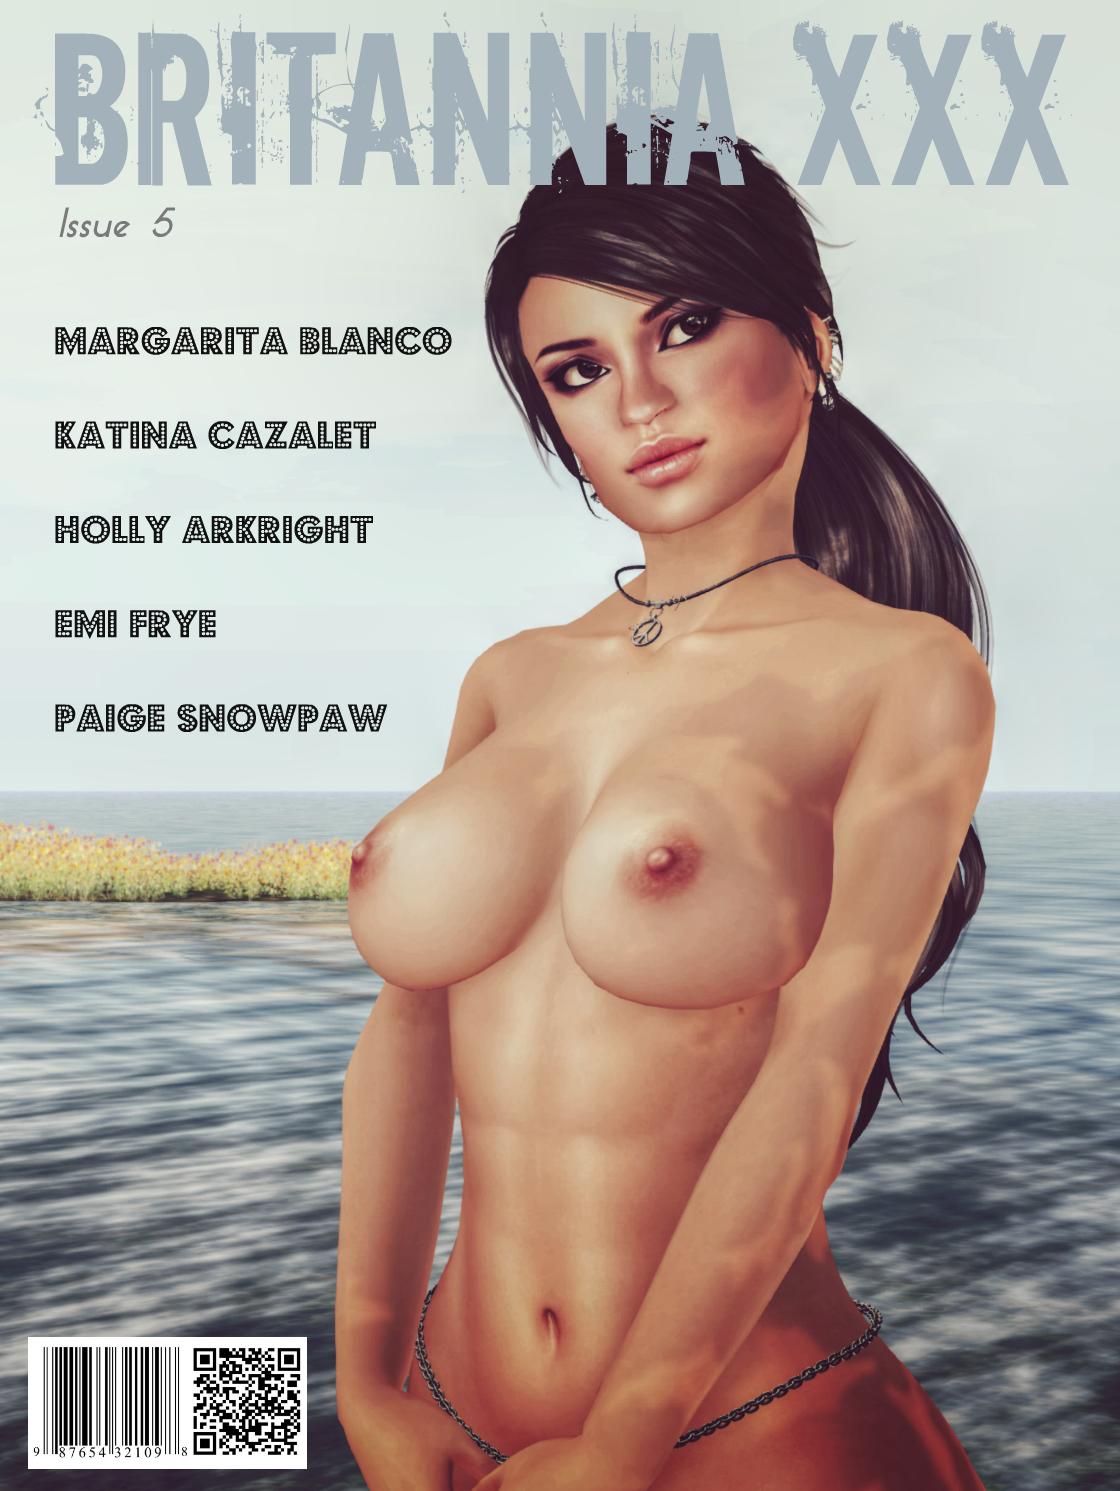 Xxx magazine online, good boob shots